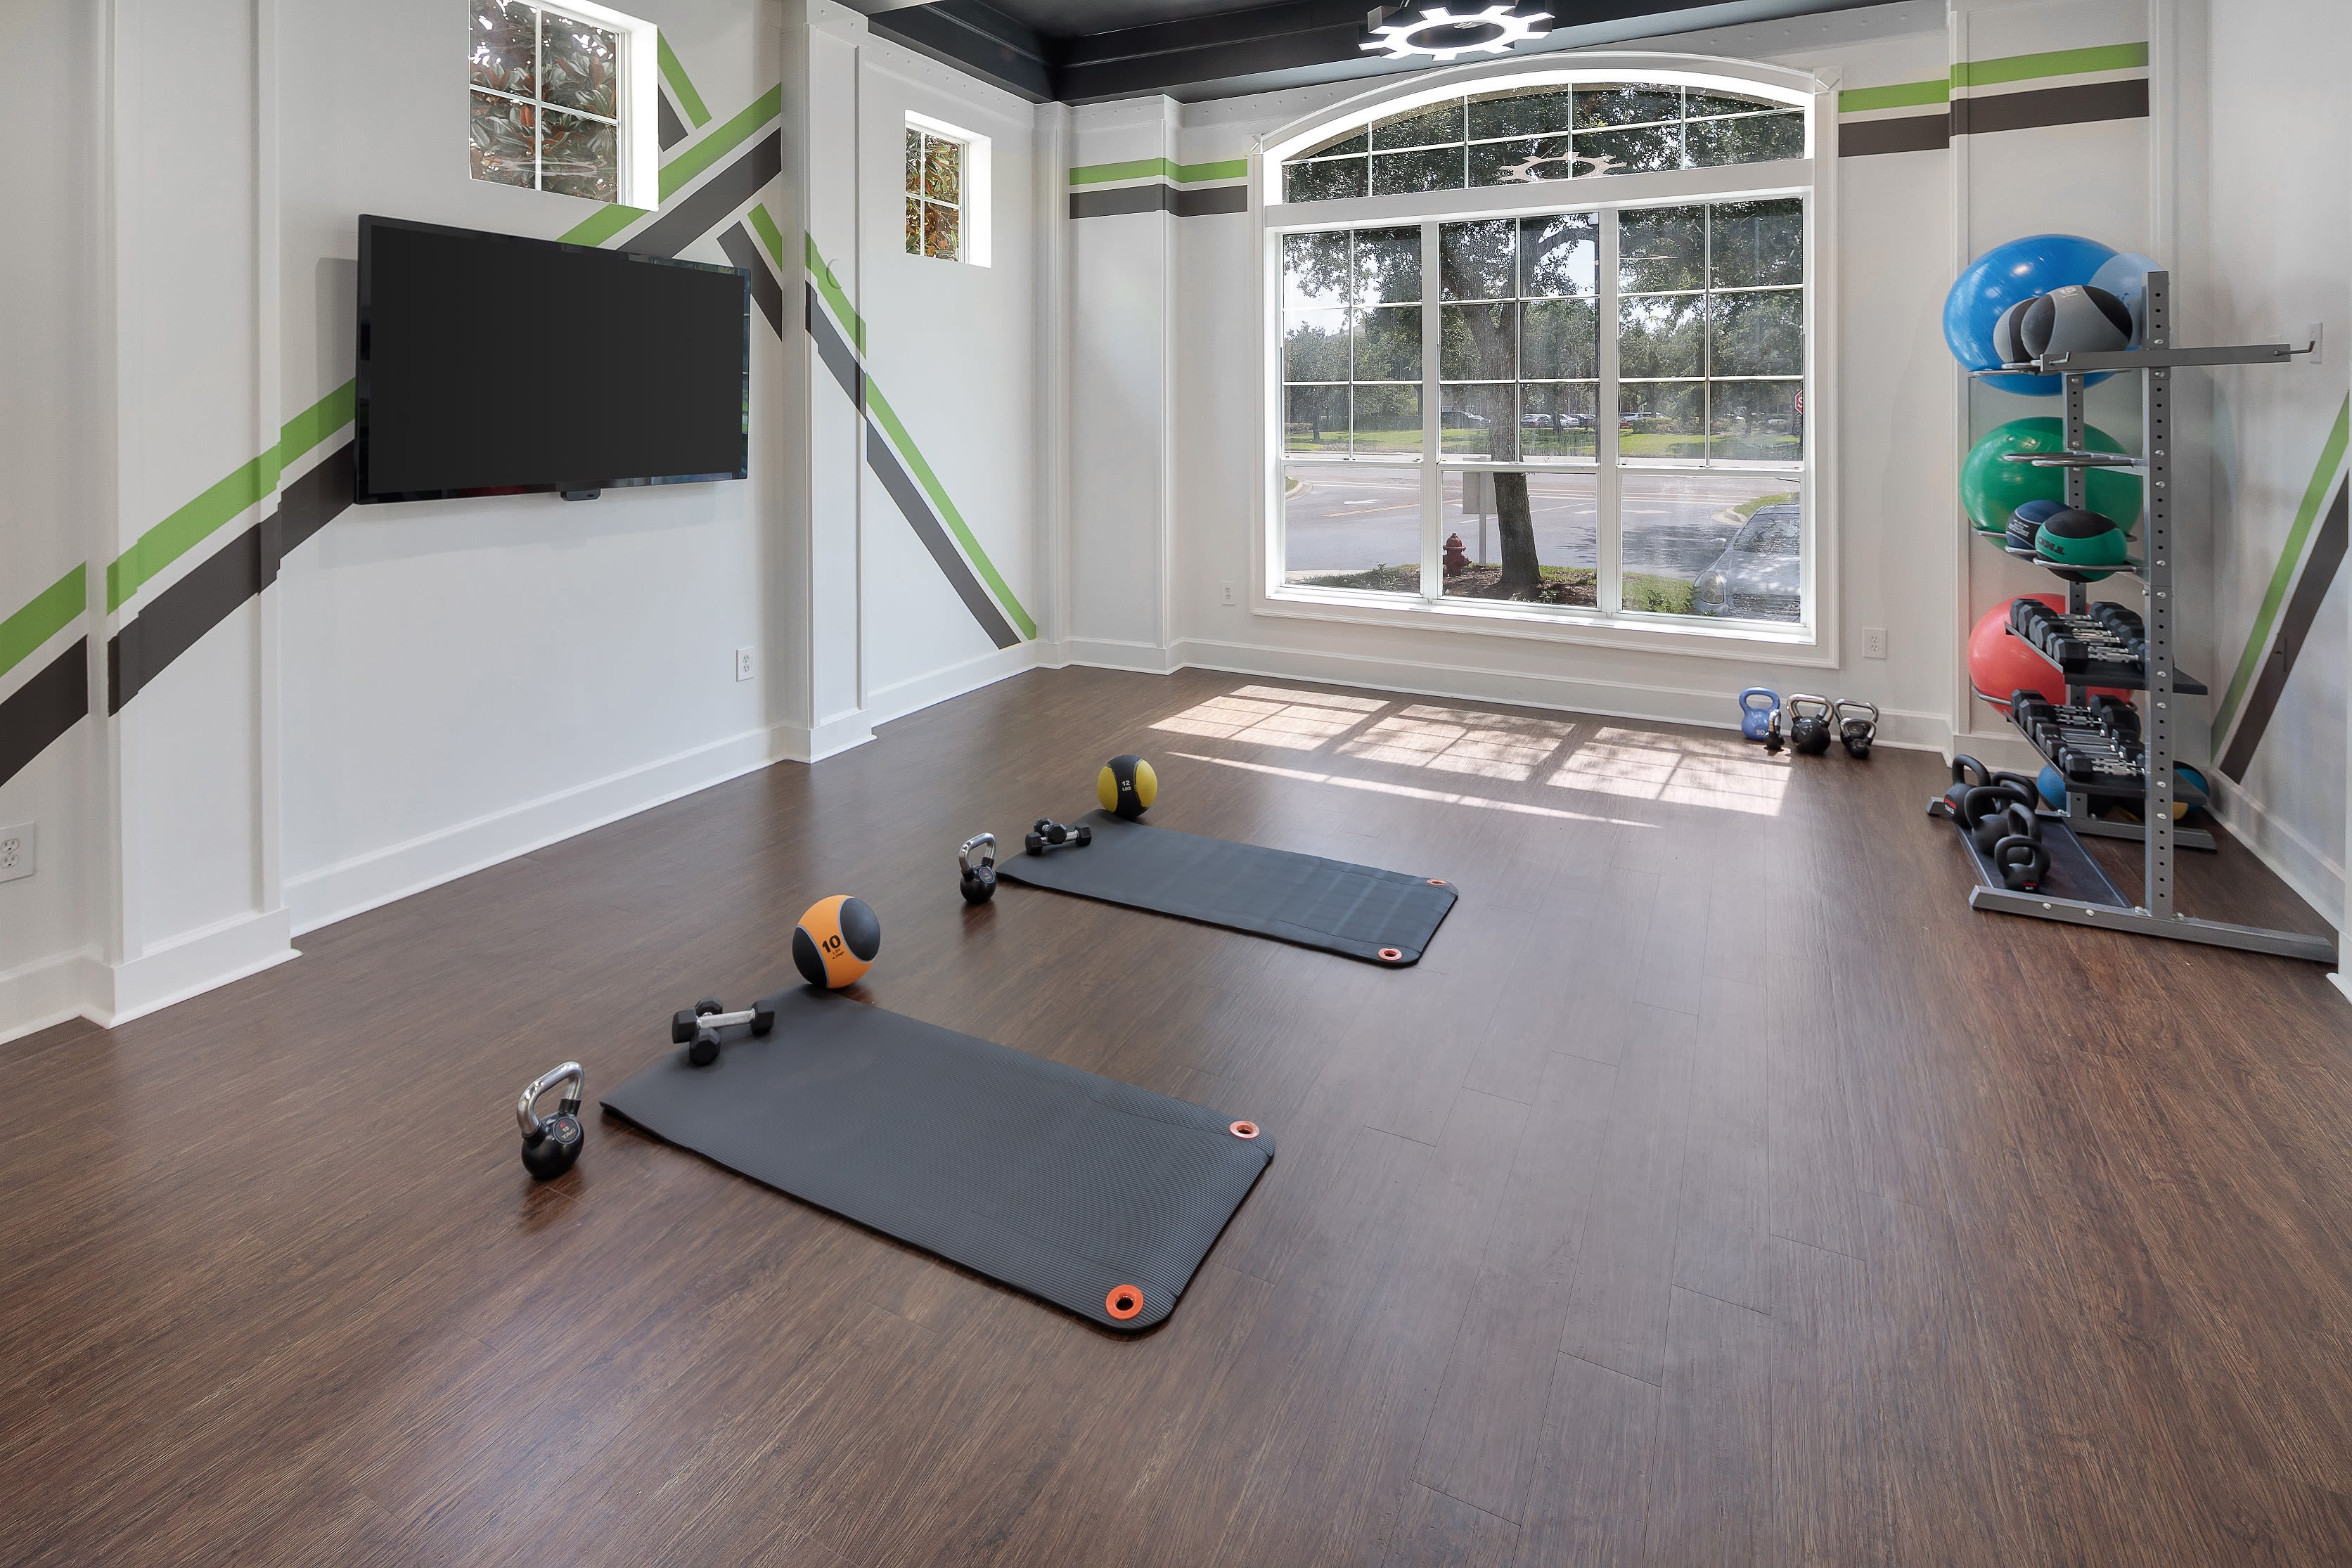 Fitness center for residents at Eddison at Deerwood Park in Jacksonville, Florida